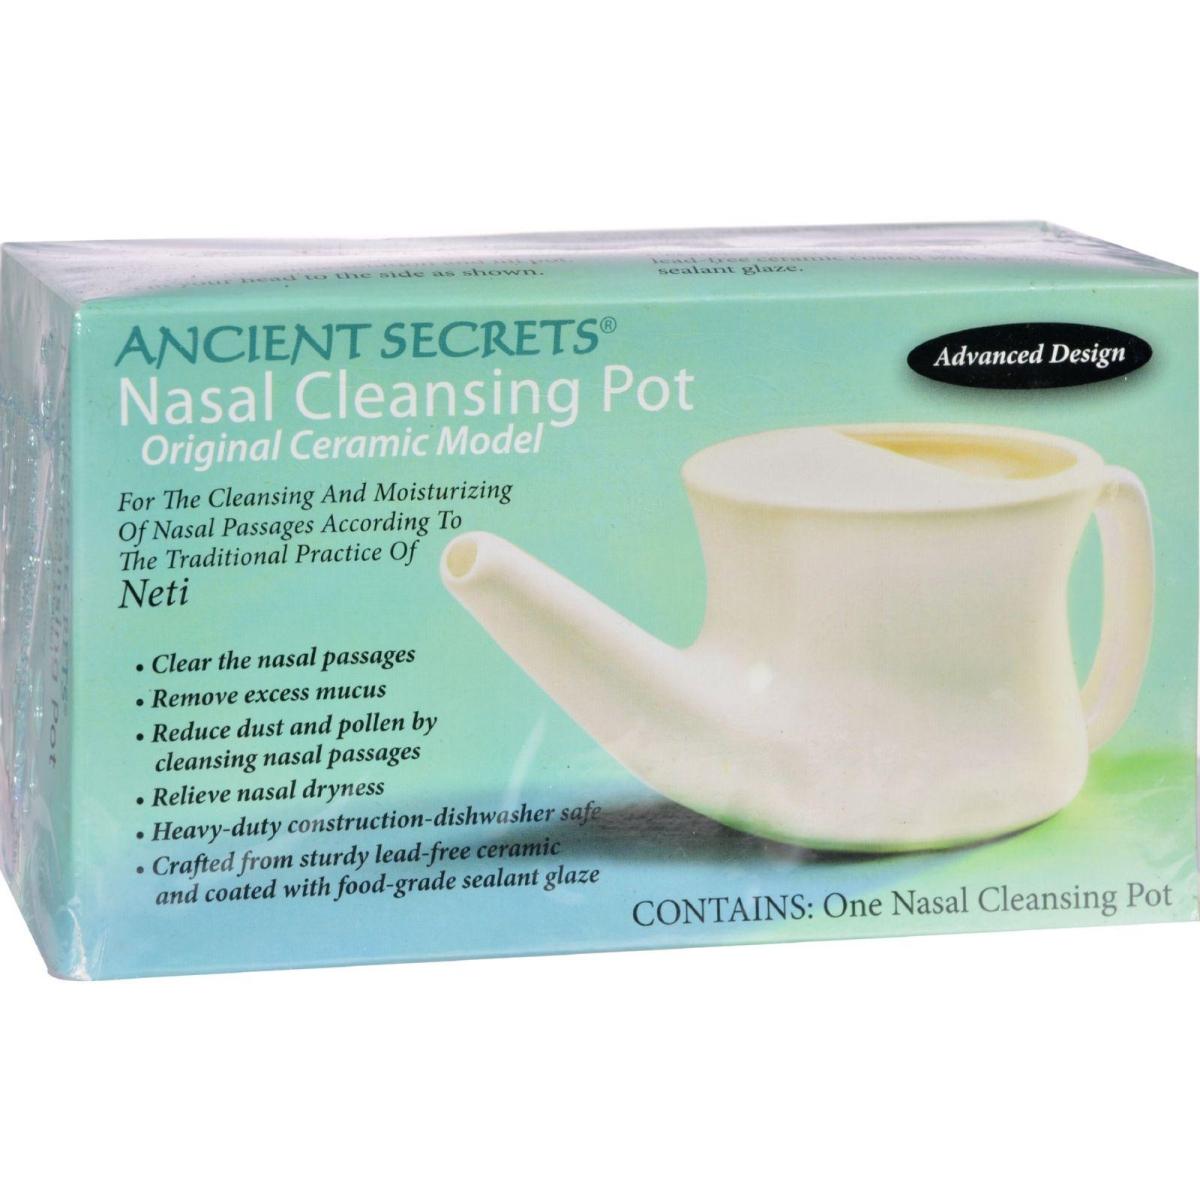 Ancient Secrets HG0201772 Nasal Cleansing Pot - 1 Pot